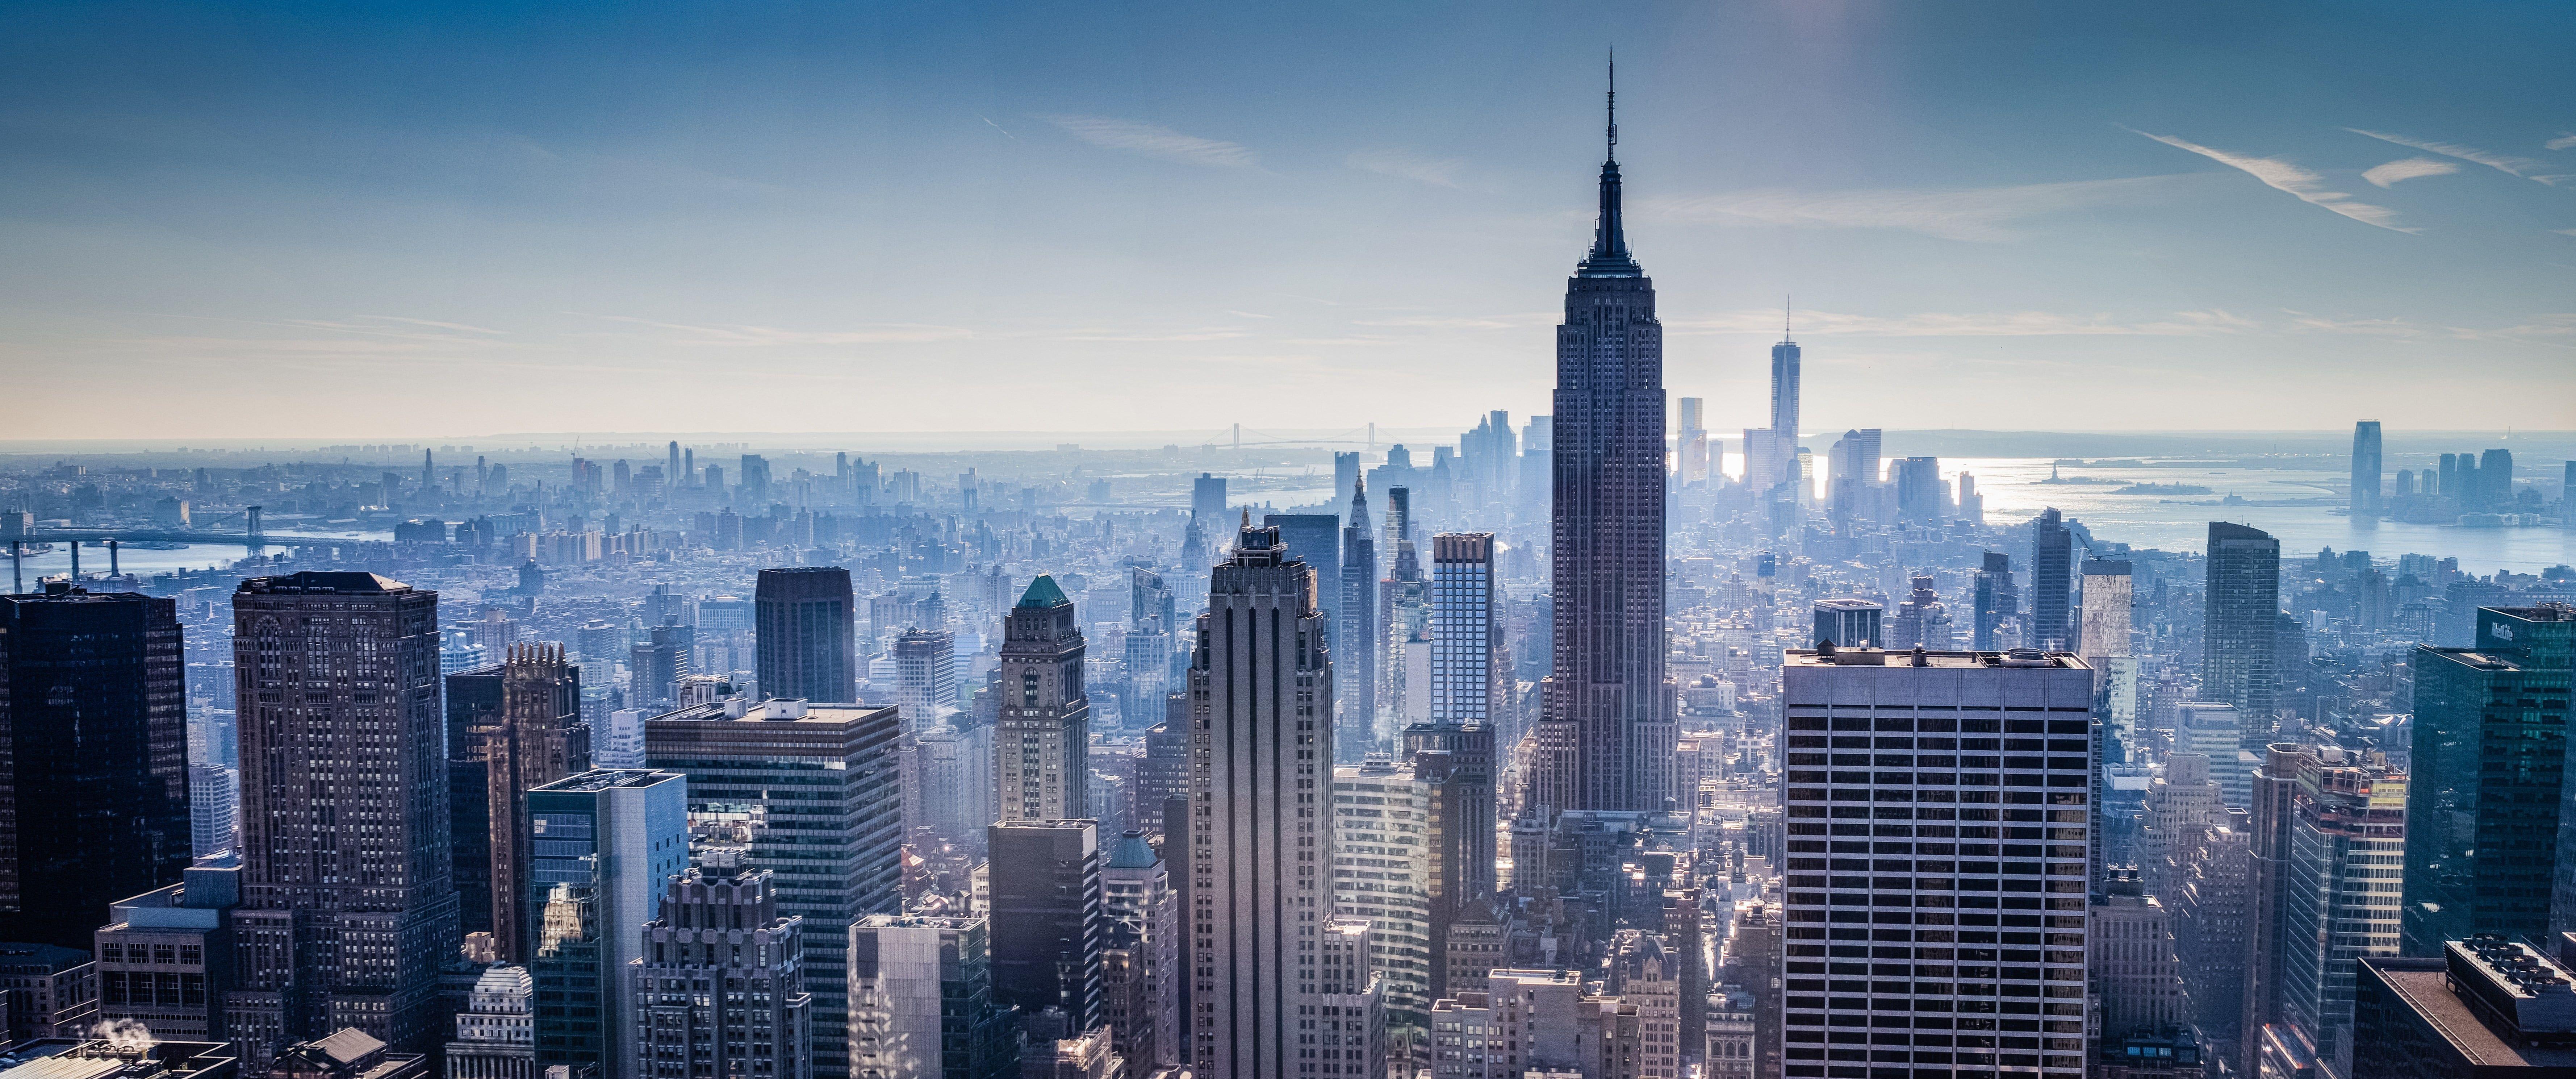 Empire State Building New York New York City Building Cityscape 5k Wallpaper Hdwallpaper Desktop Buildings Photography Skyscraper 3440x1440 Wallpaper